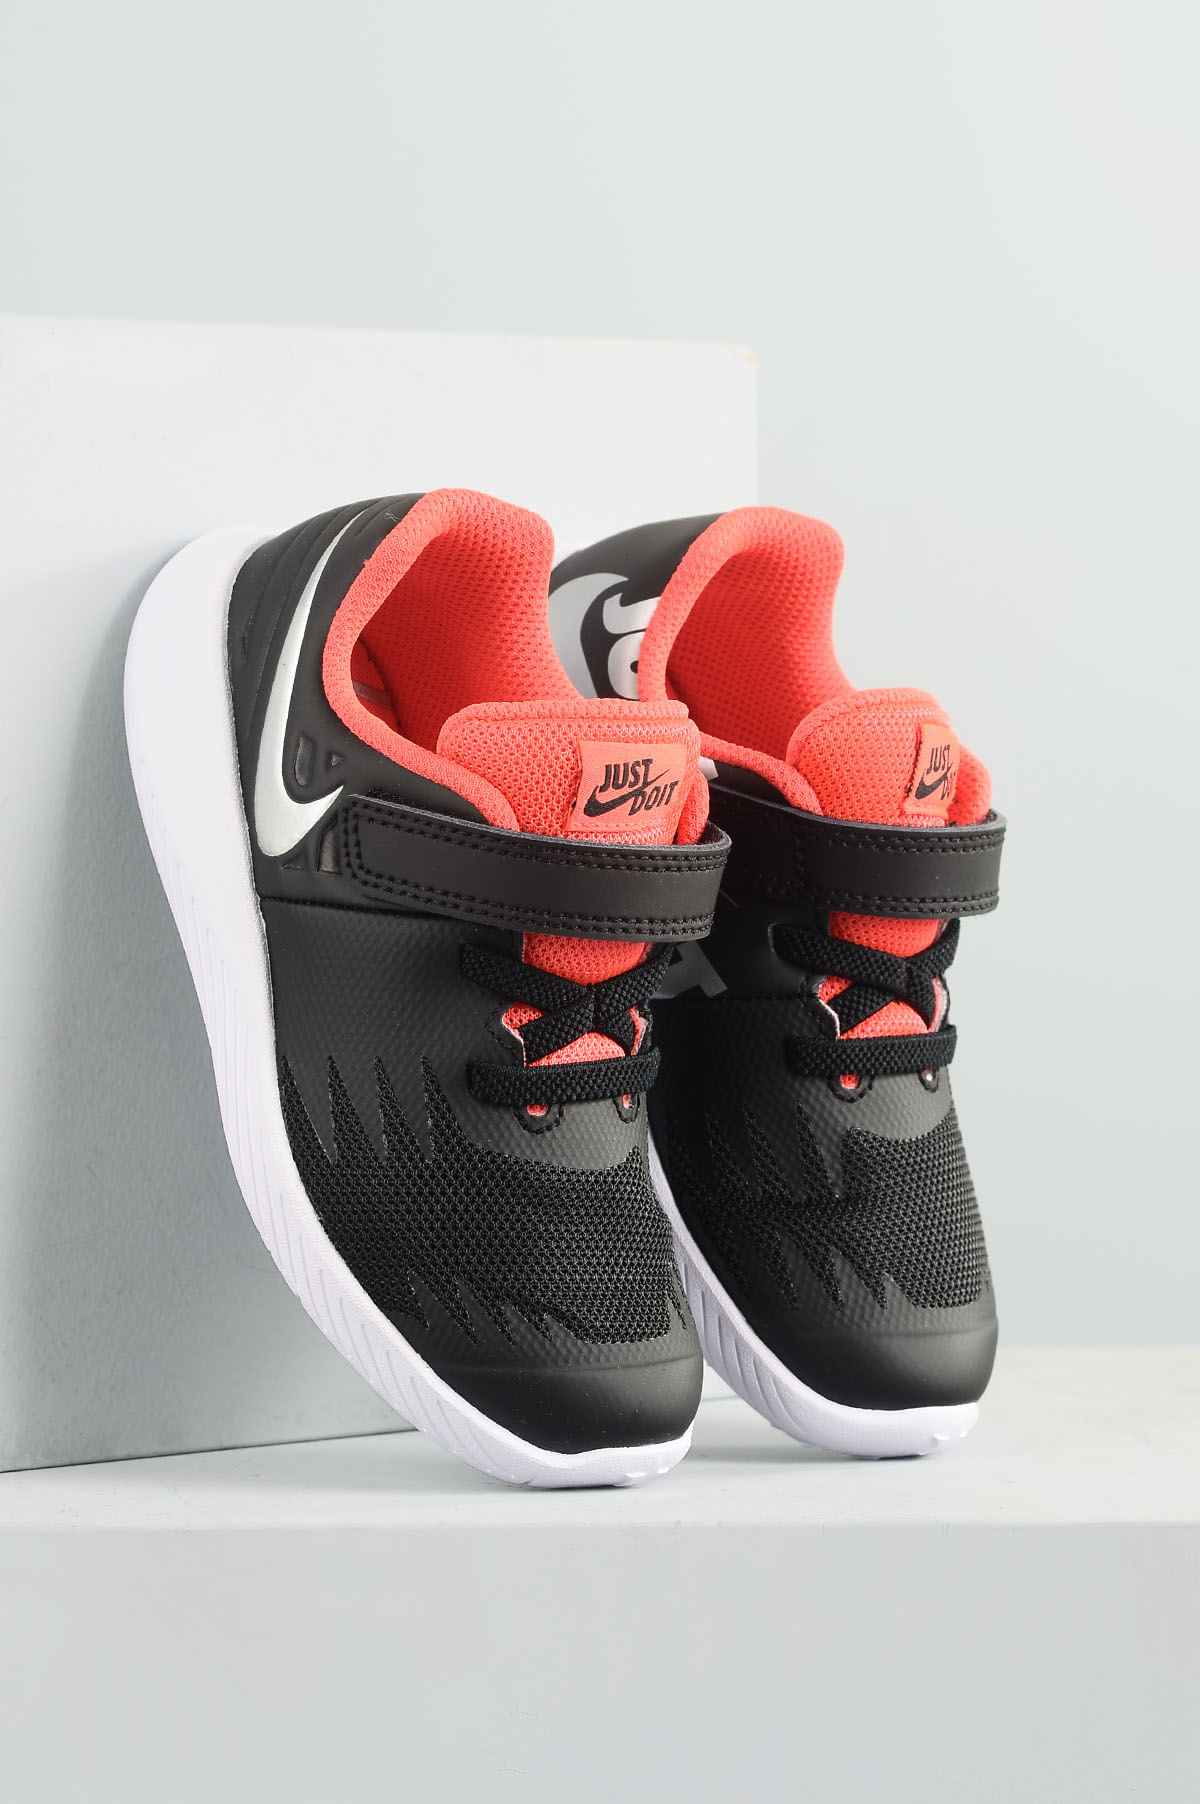 0cb3c1556c9 Tênis Infantil Nike Star Runner JDI SINT - PRETO - Mundial Calçados